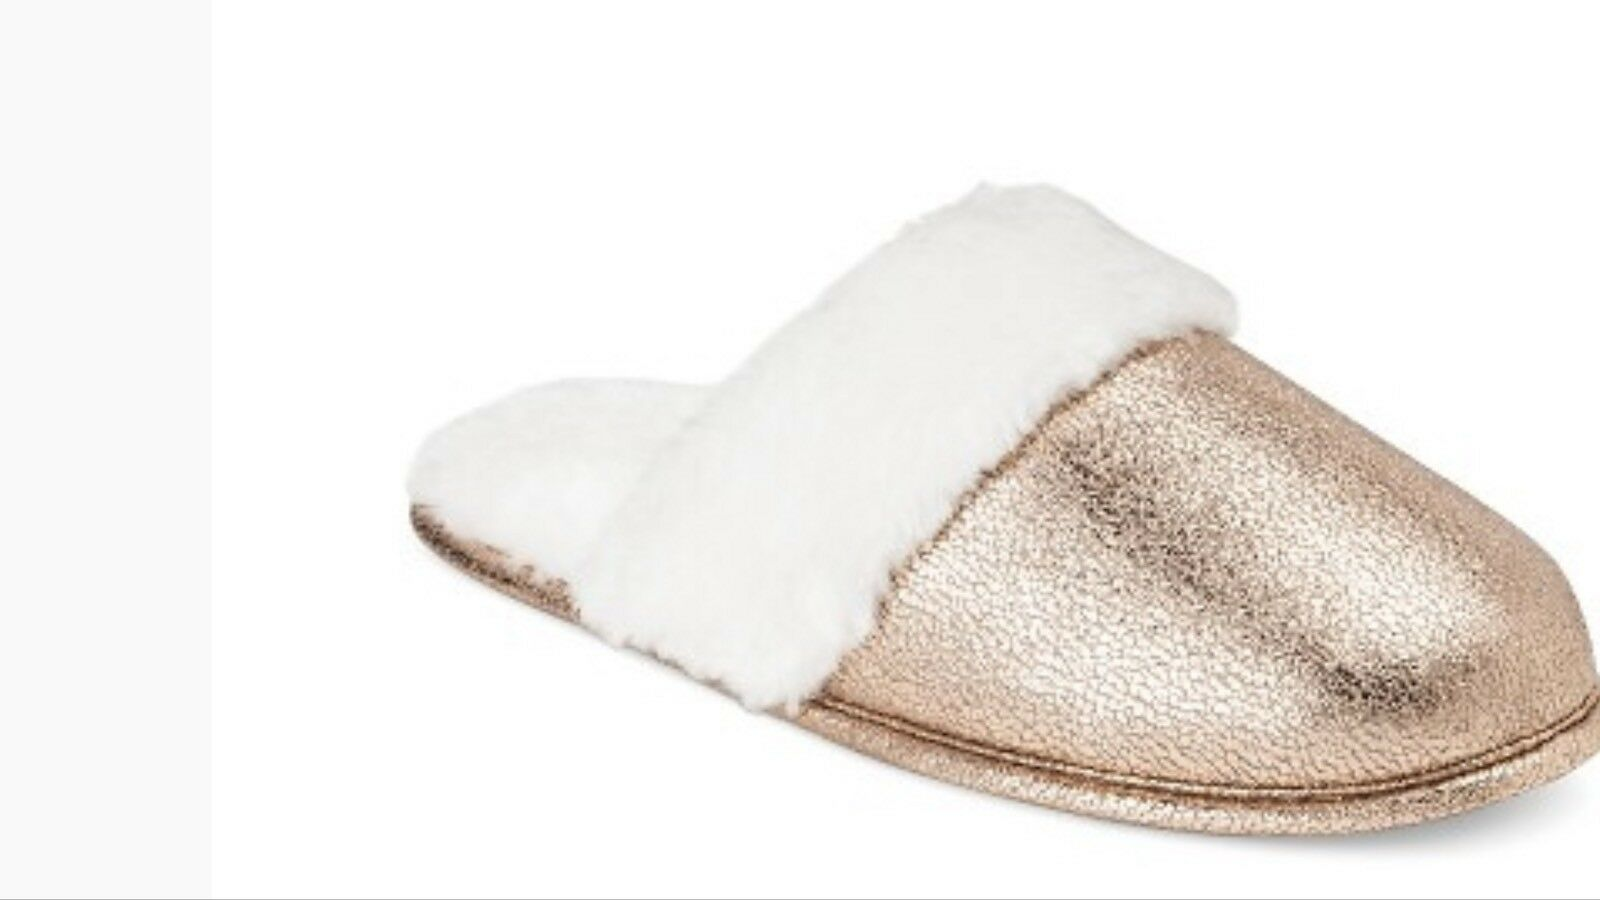 Womens Xhilaration Gold/White Slippers W/ Faux Fur Gold/White Xhilaration Size Small 5/6 -NEW 2e55c3